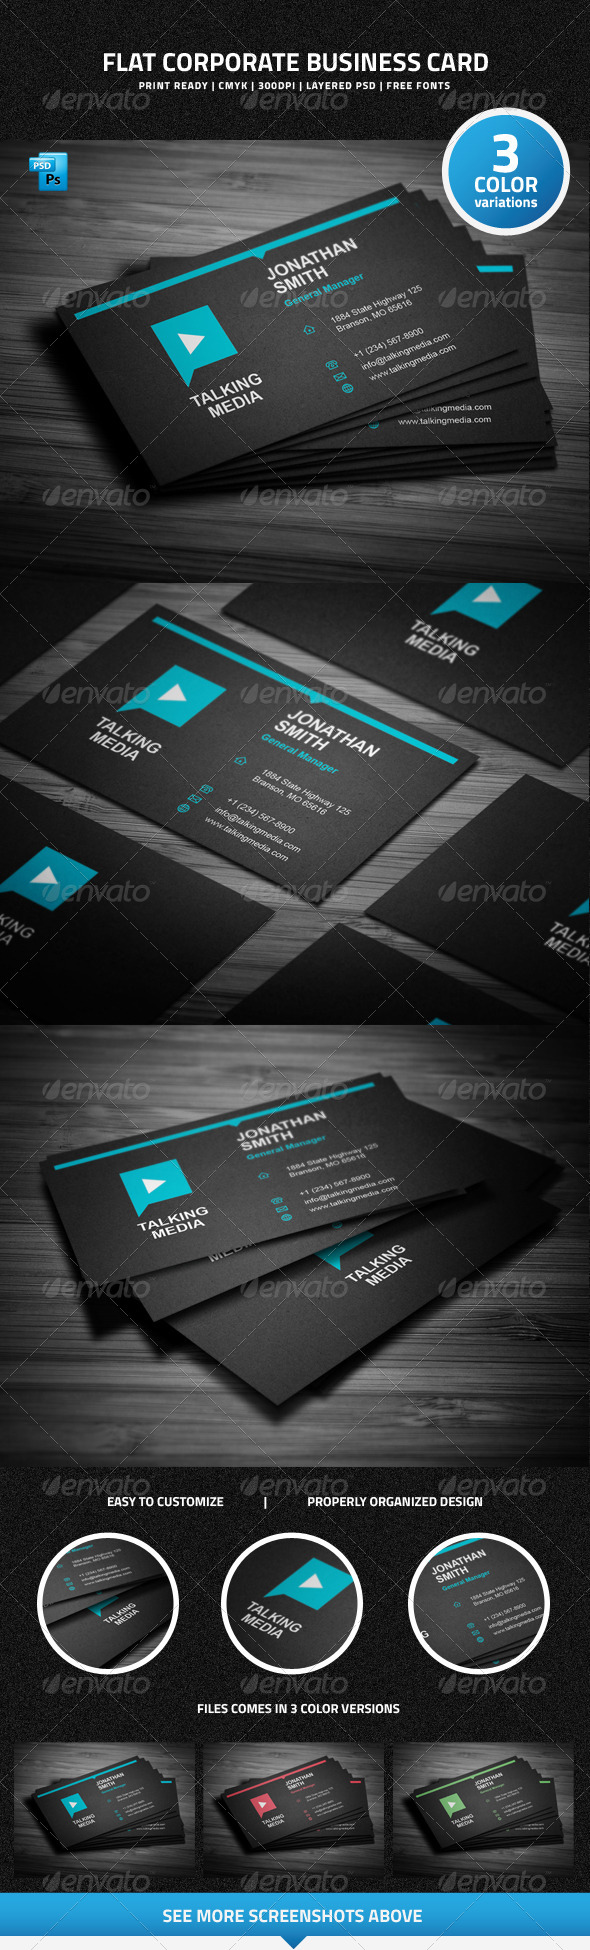 Flat Corporate Business Card - 27 - Corporate Business Cards